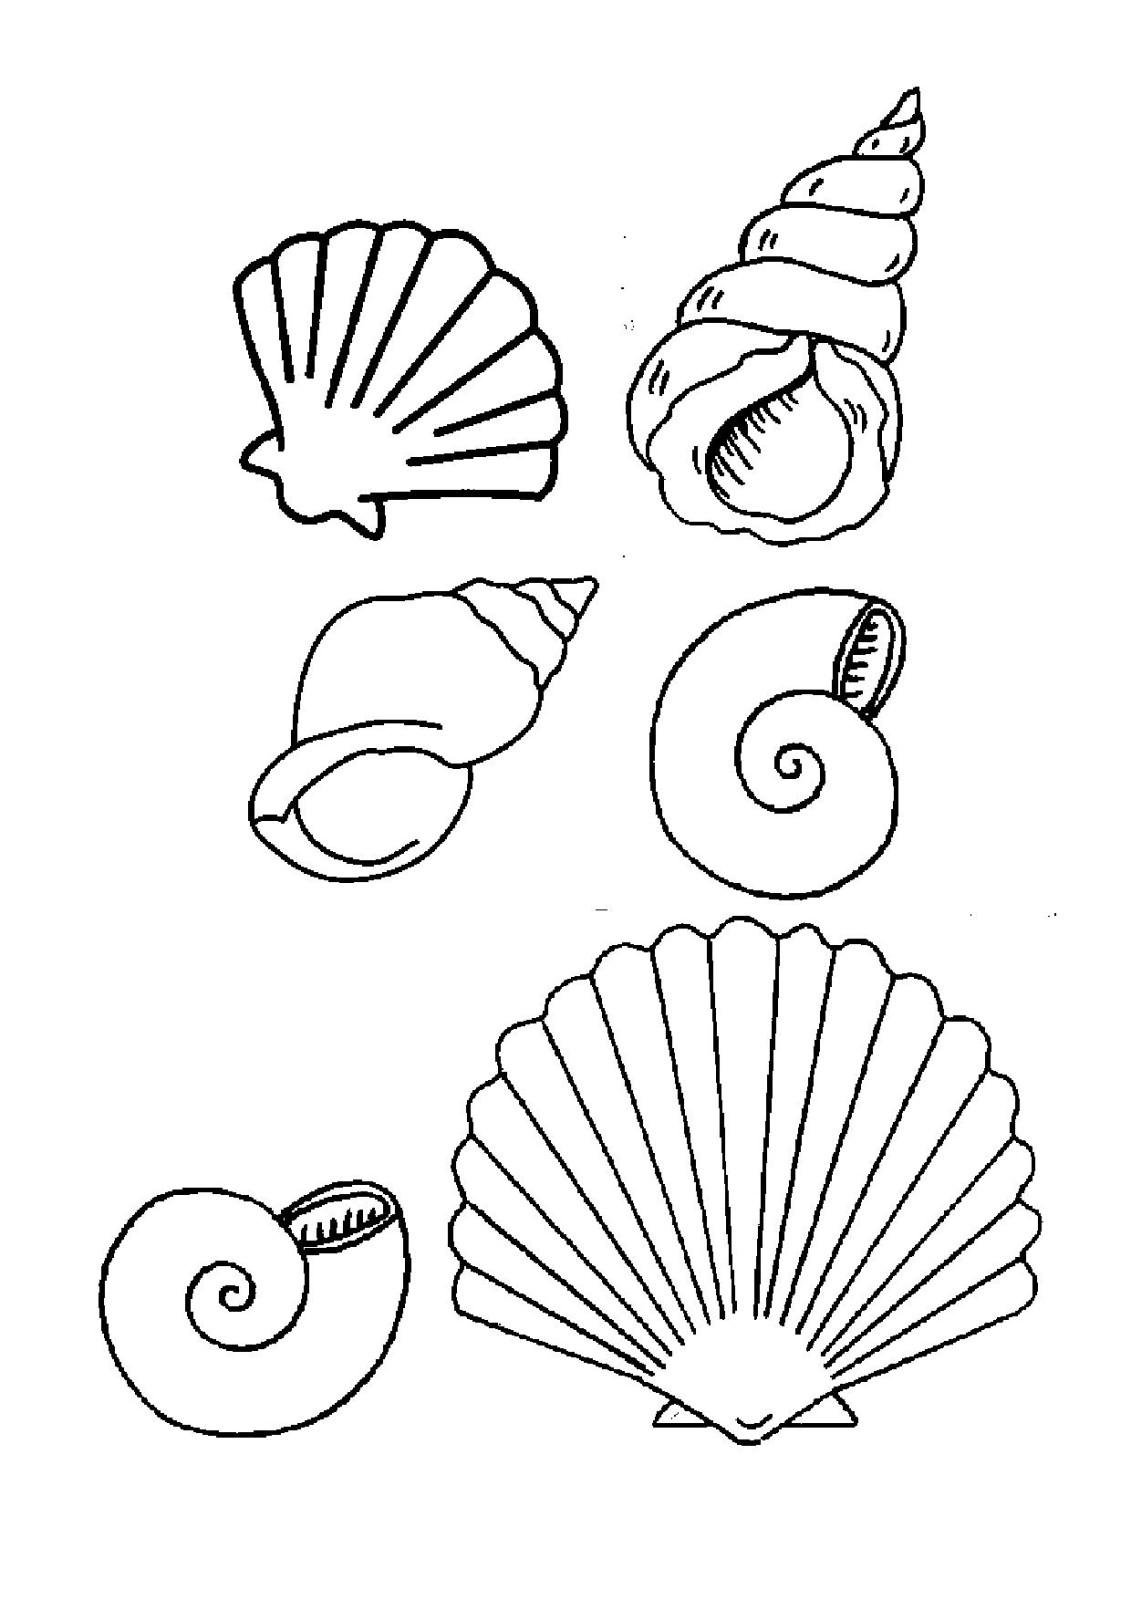 19 dessins de coloriage coquillage imprimer imprimer - Dessin de coquillage ...